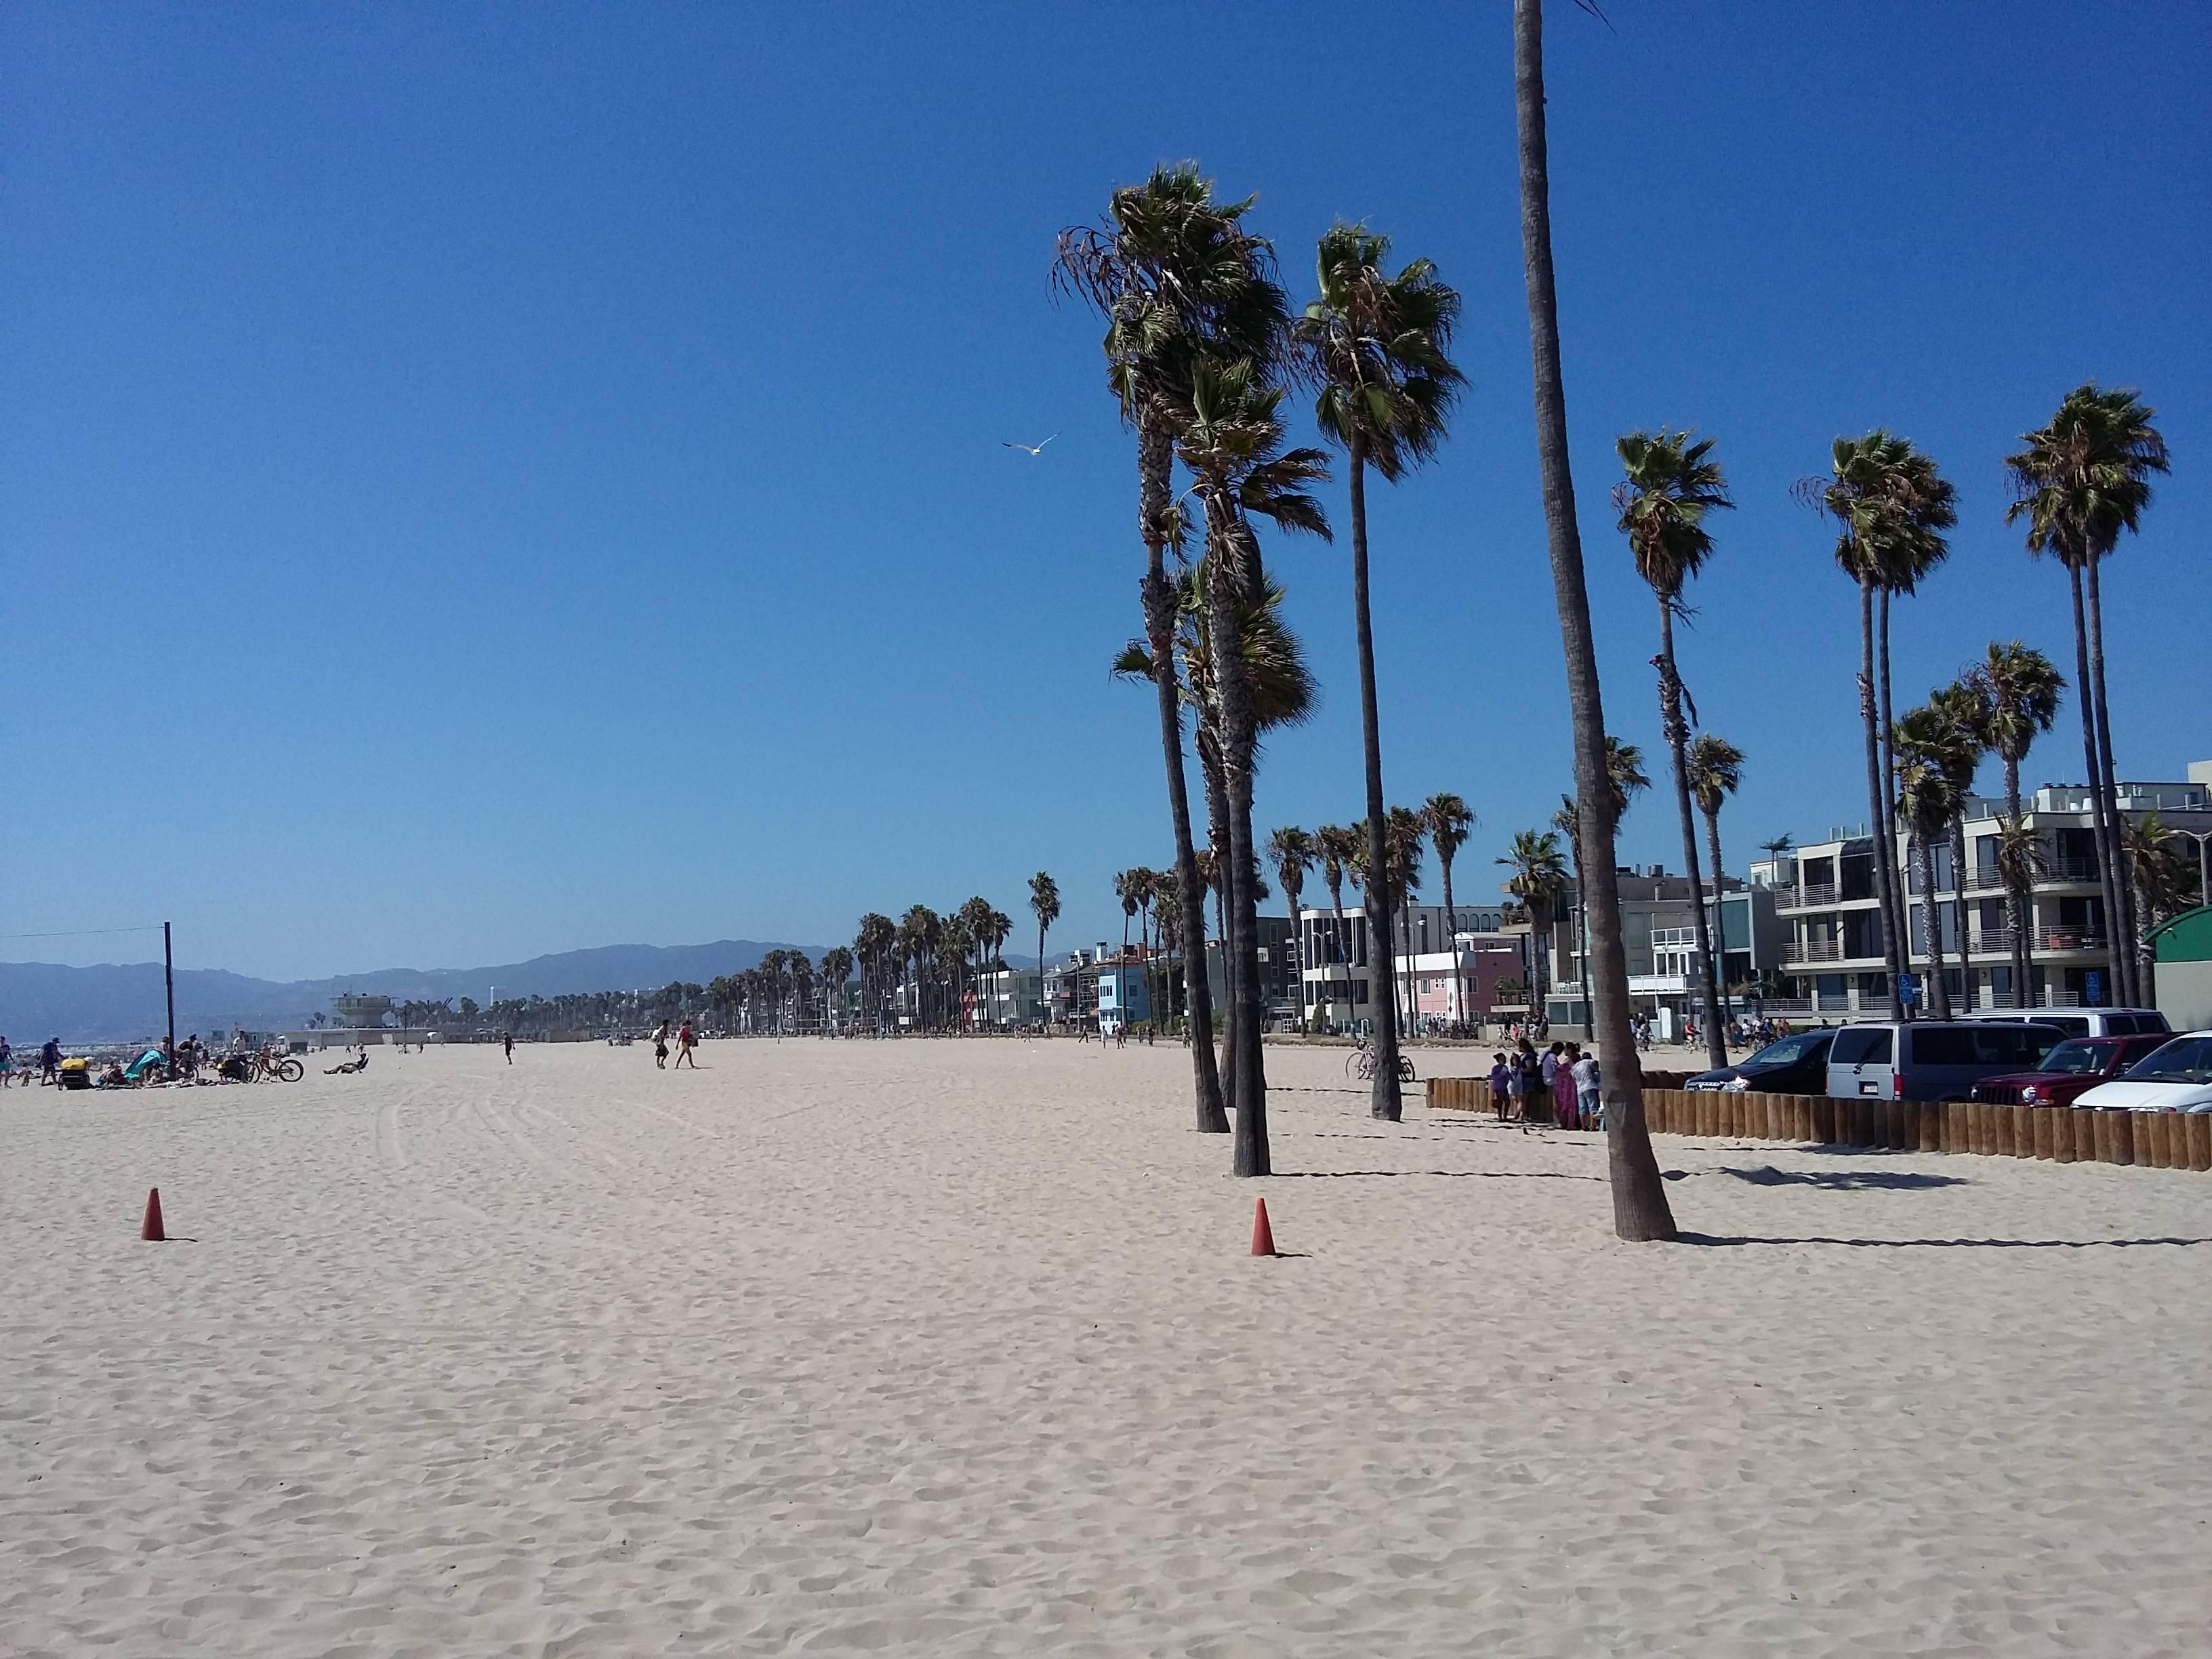 Photo 2: De Santa Monica à Venice beach en Vélo